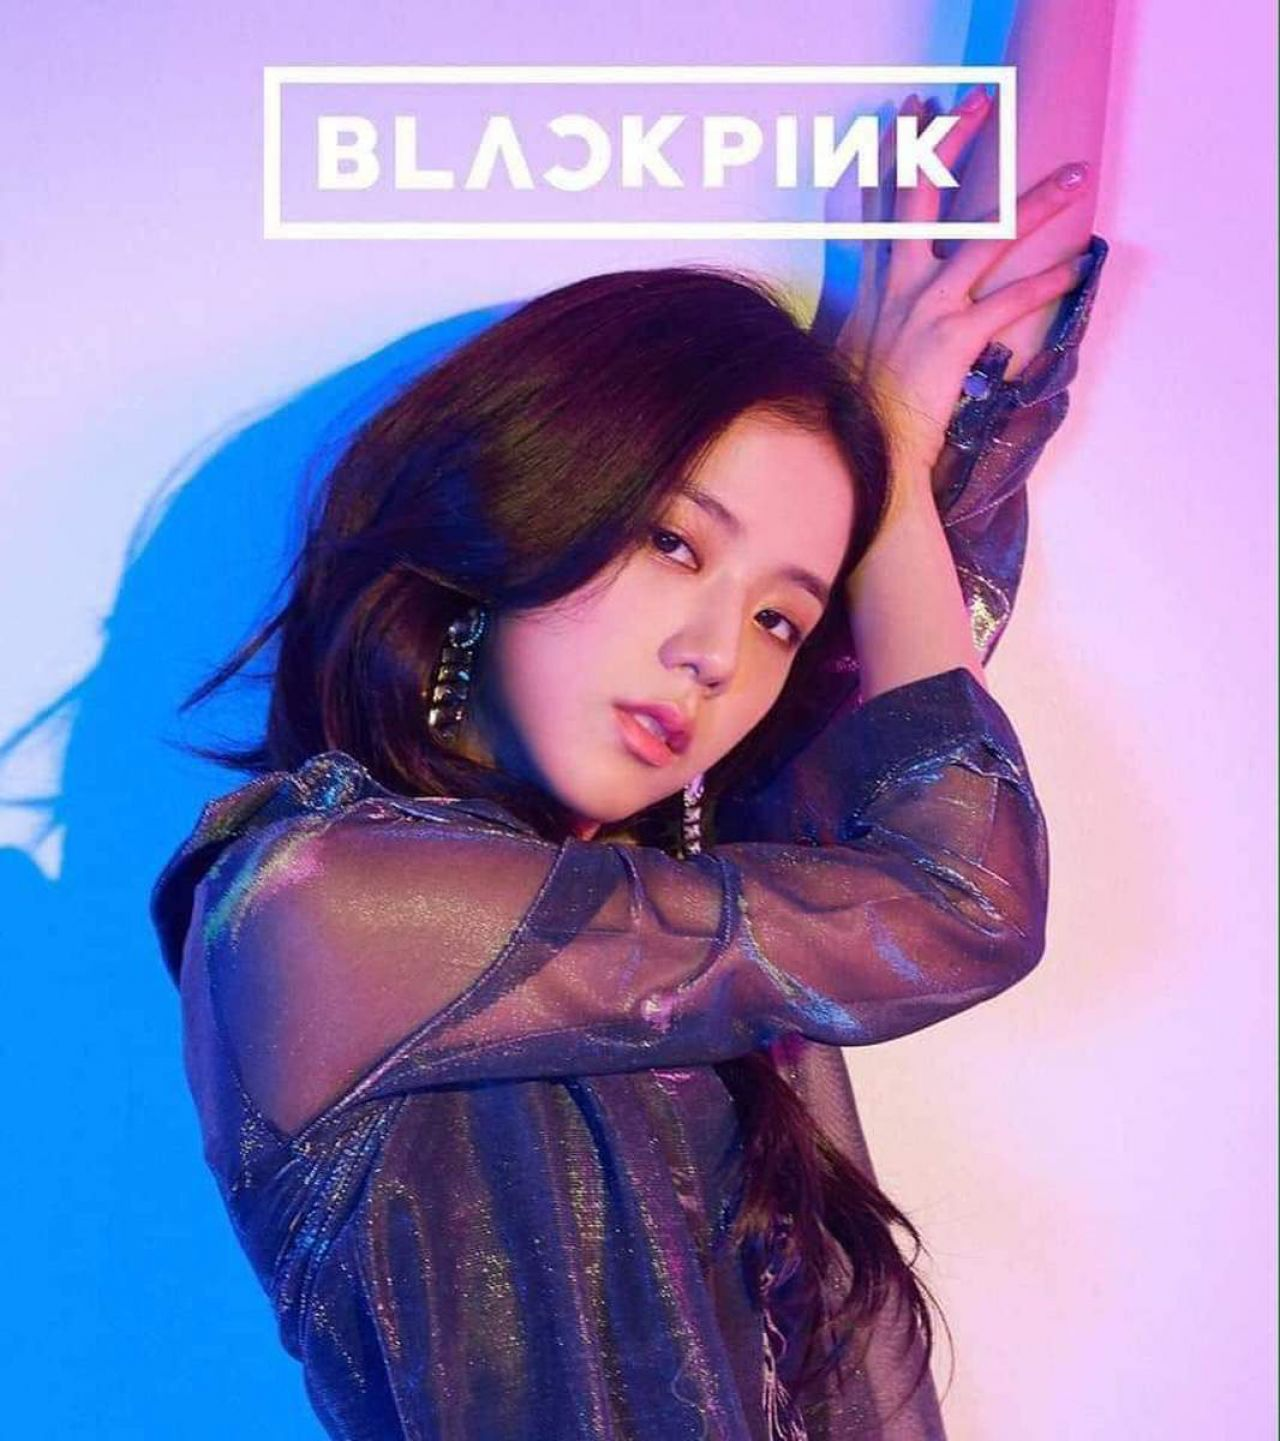 Blackpink - Blackpink In Your Area 1St Japanese Album -3427